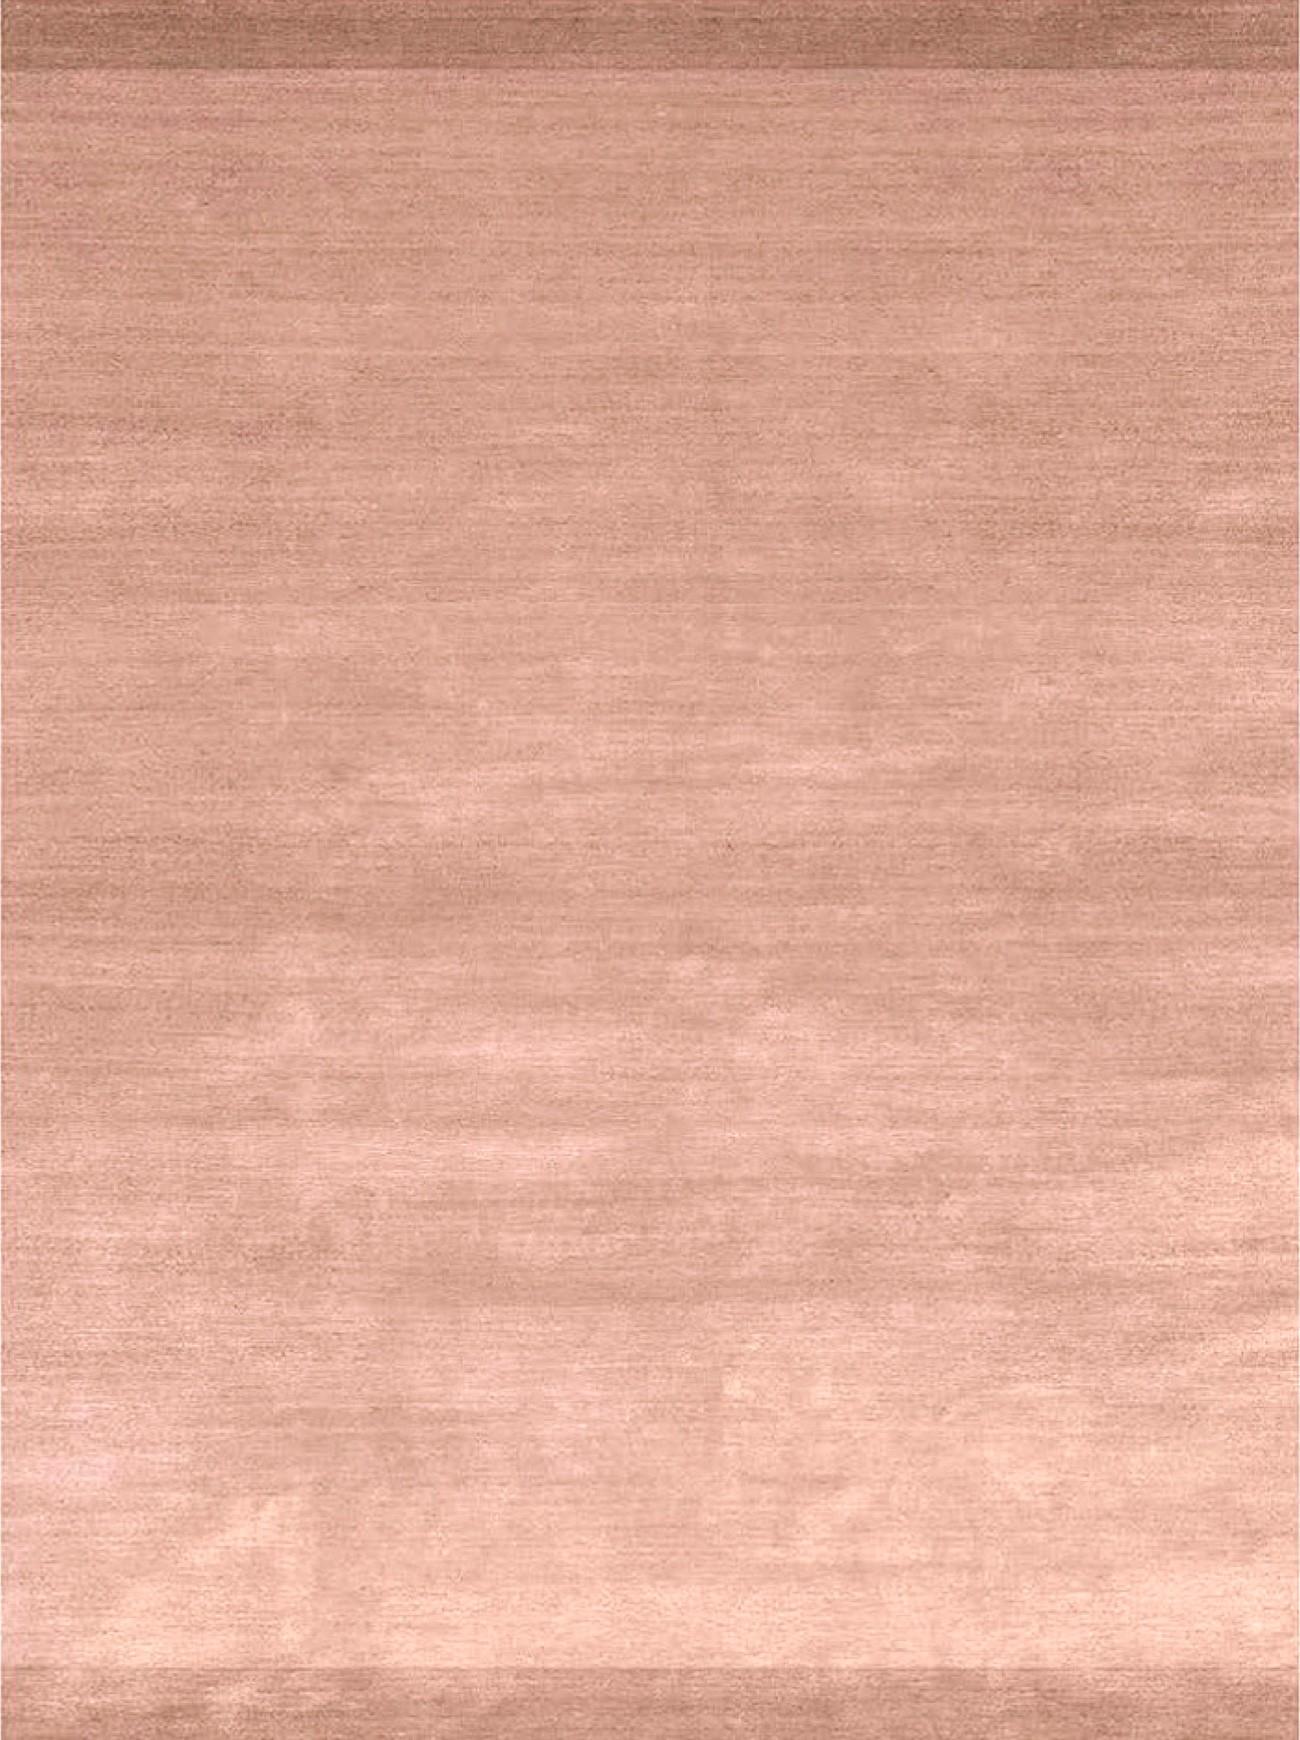 Poliform_tappeti_PLAIN_04_finiture_1300x1740px_Cipria